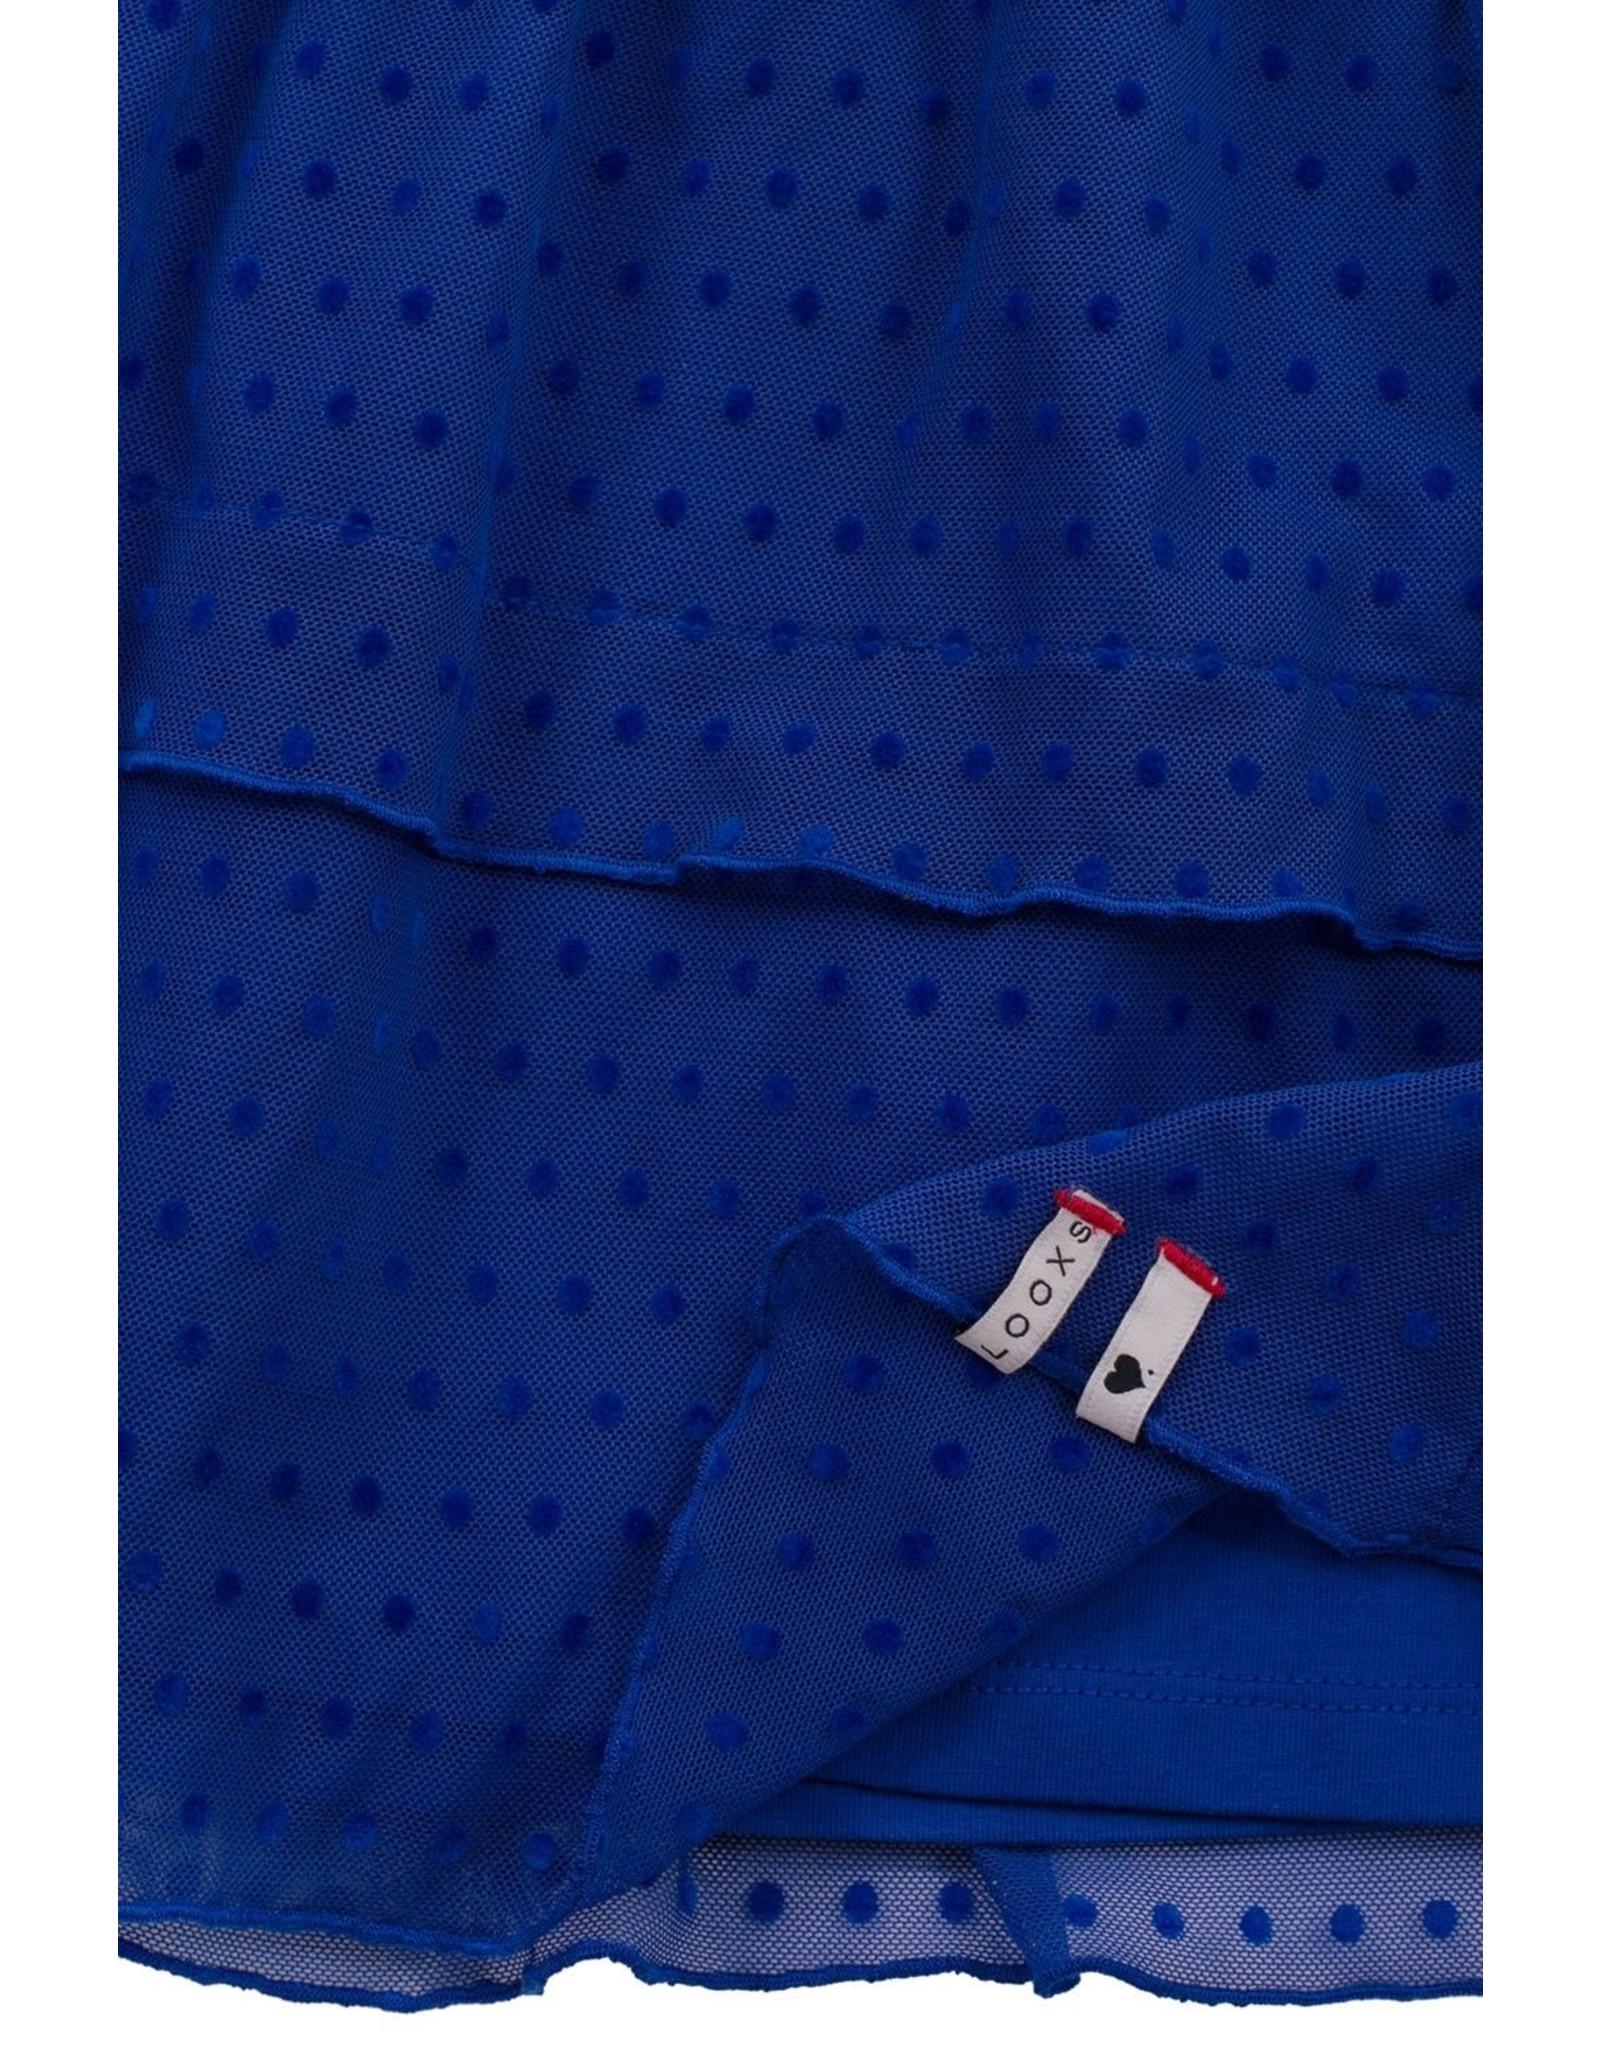 Looxs Little Little skirt kobalt